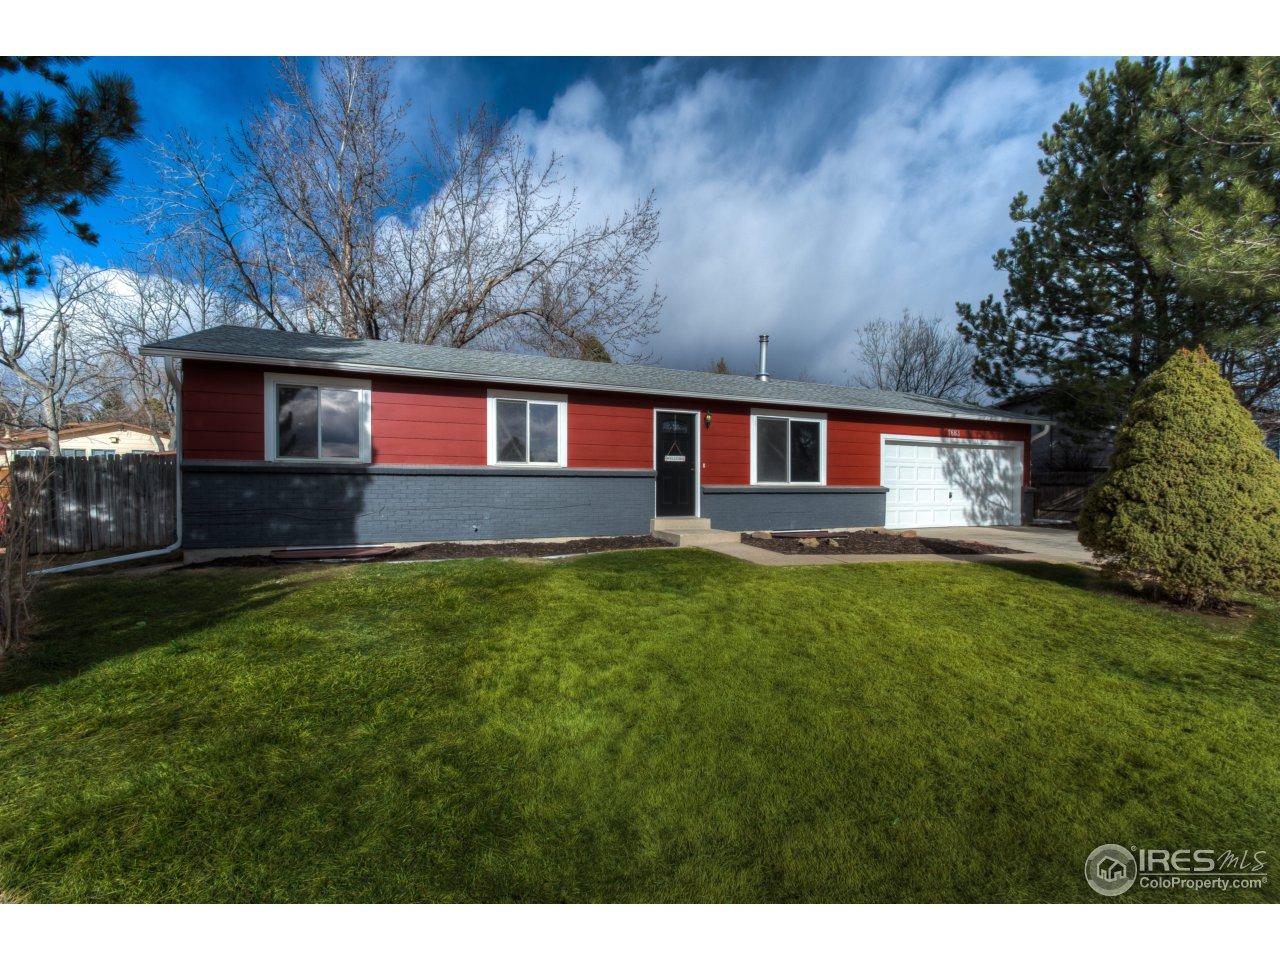 7663 Berwick Ct, Boulder CO 80301